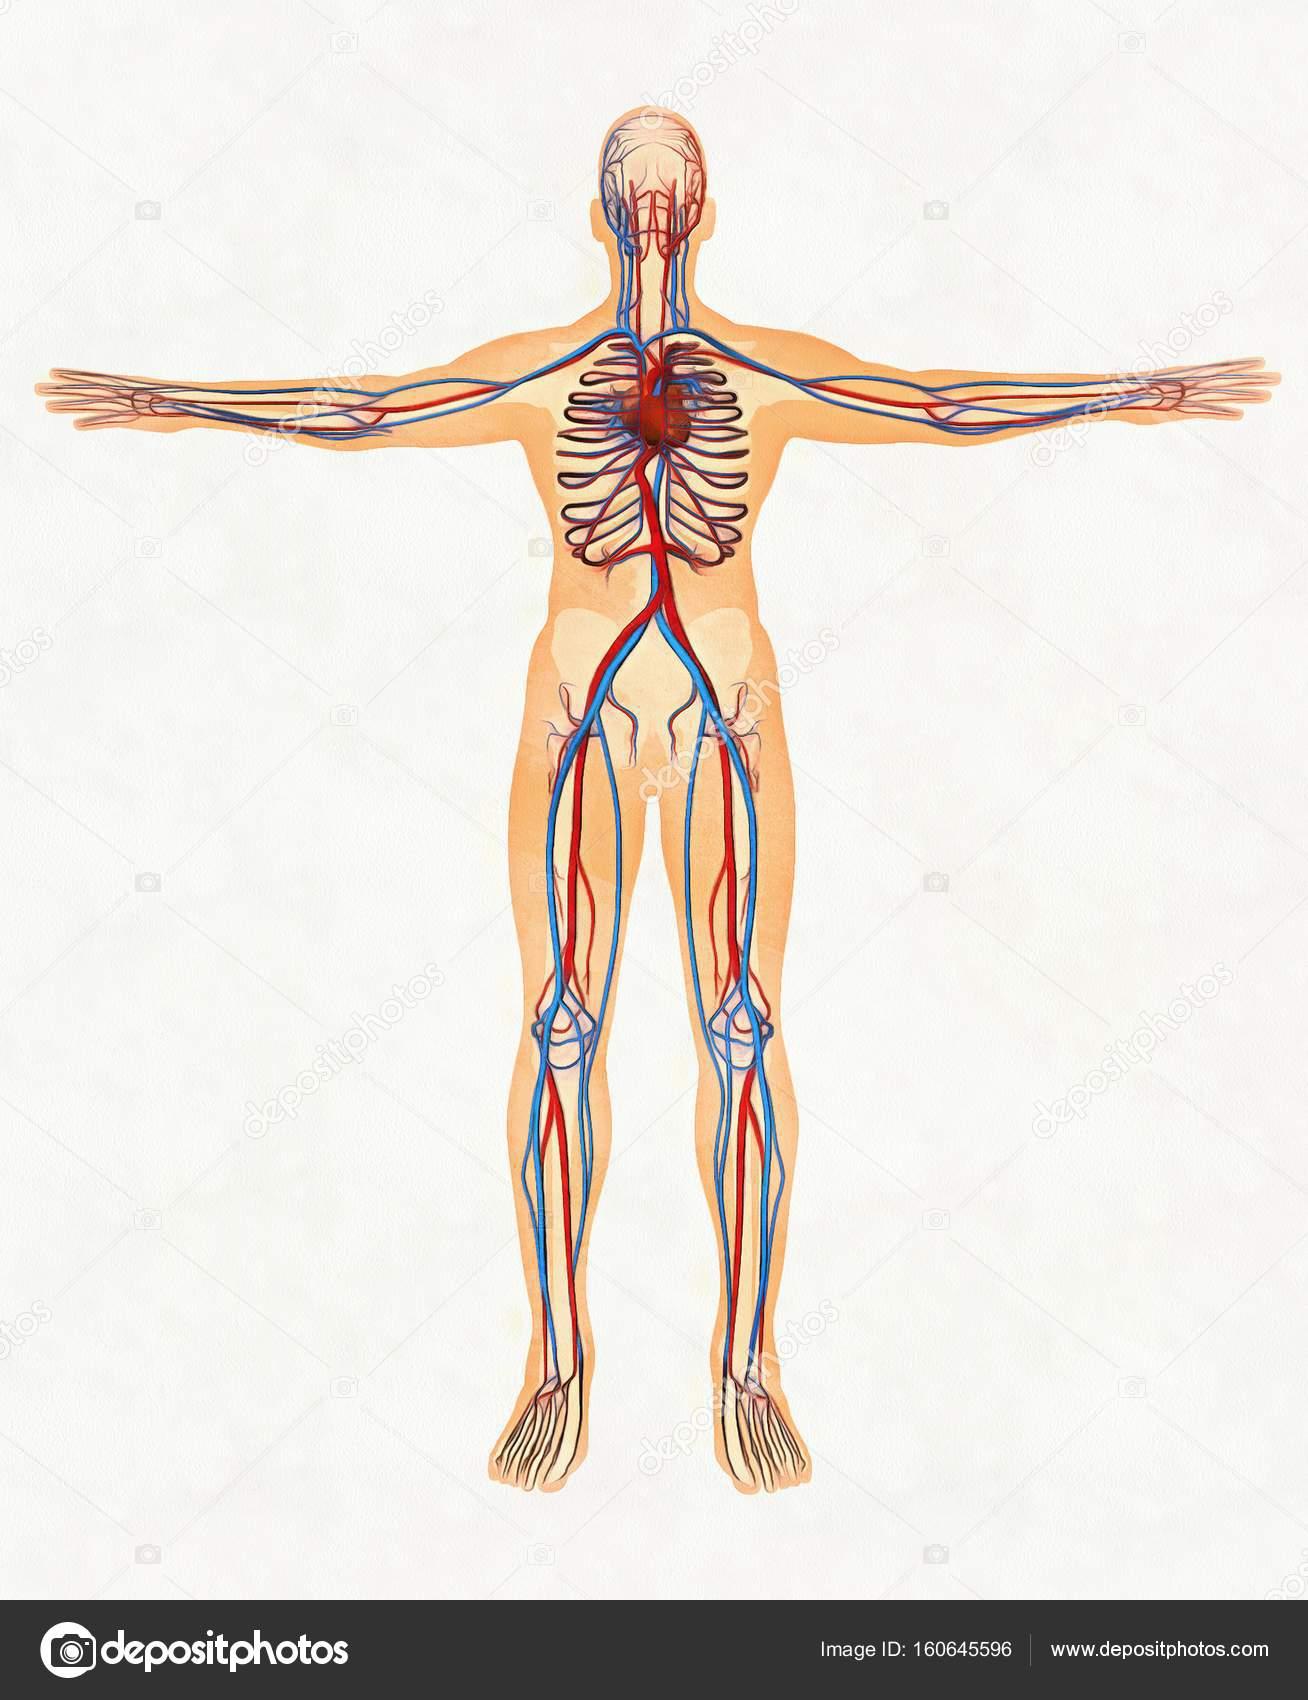 Human Body And Circulatory System Stock Photo A3artail